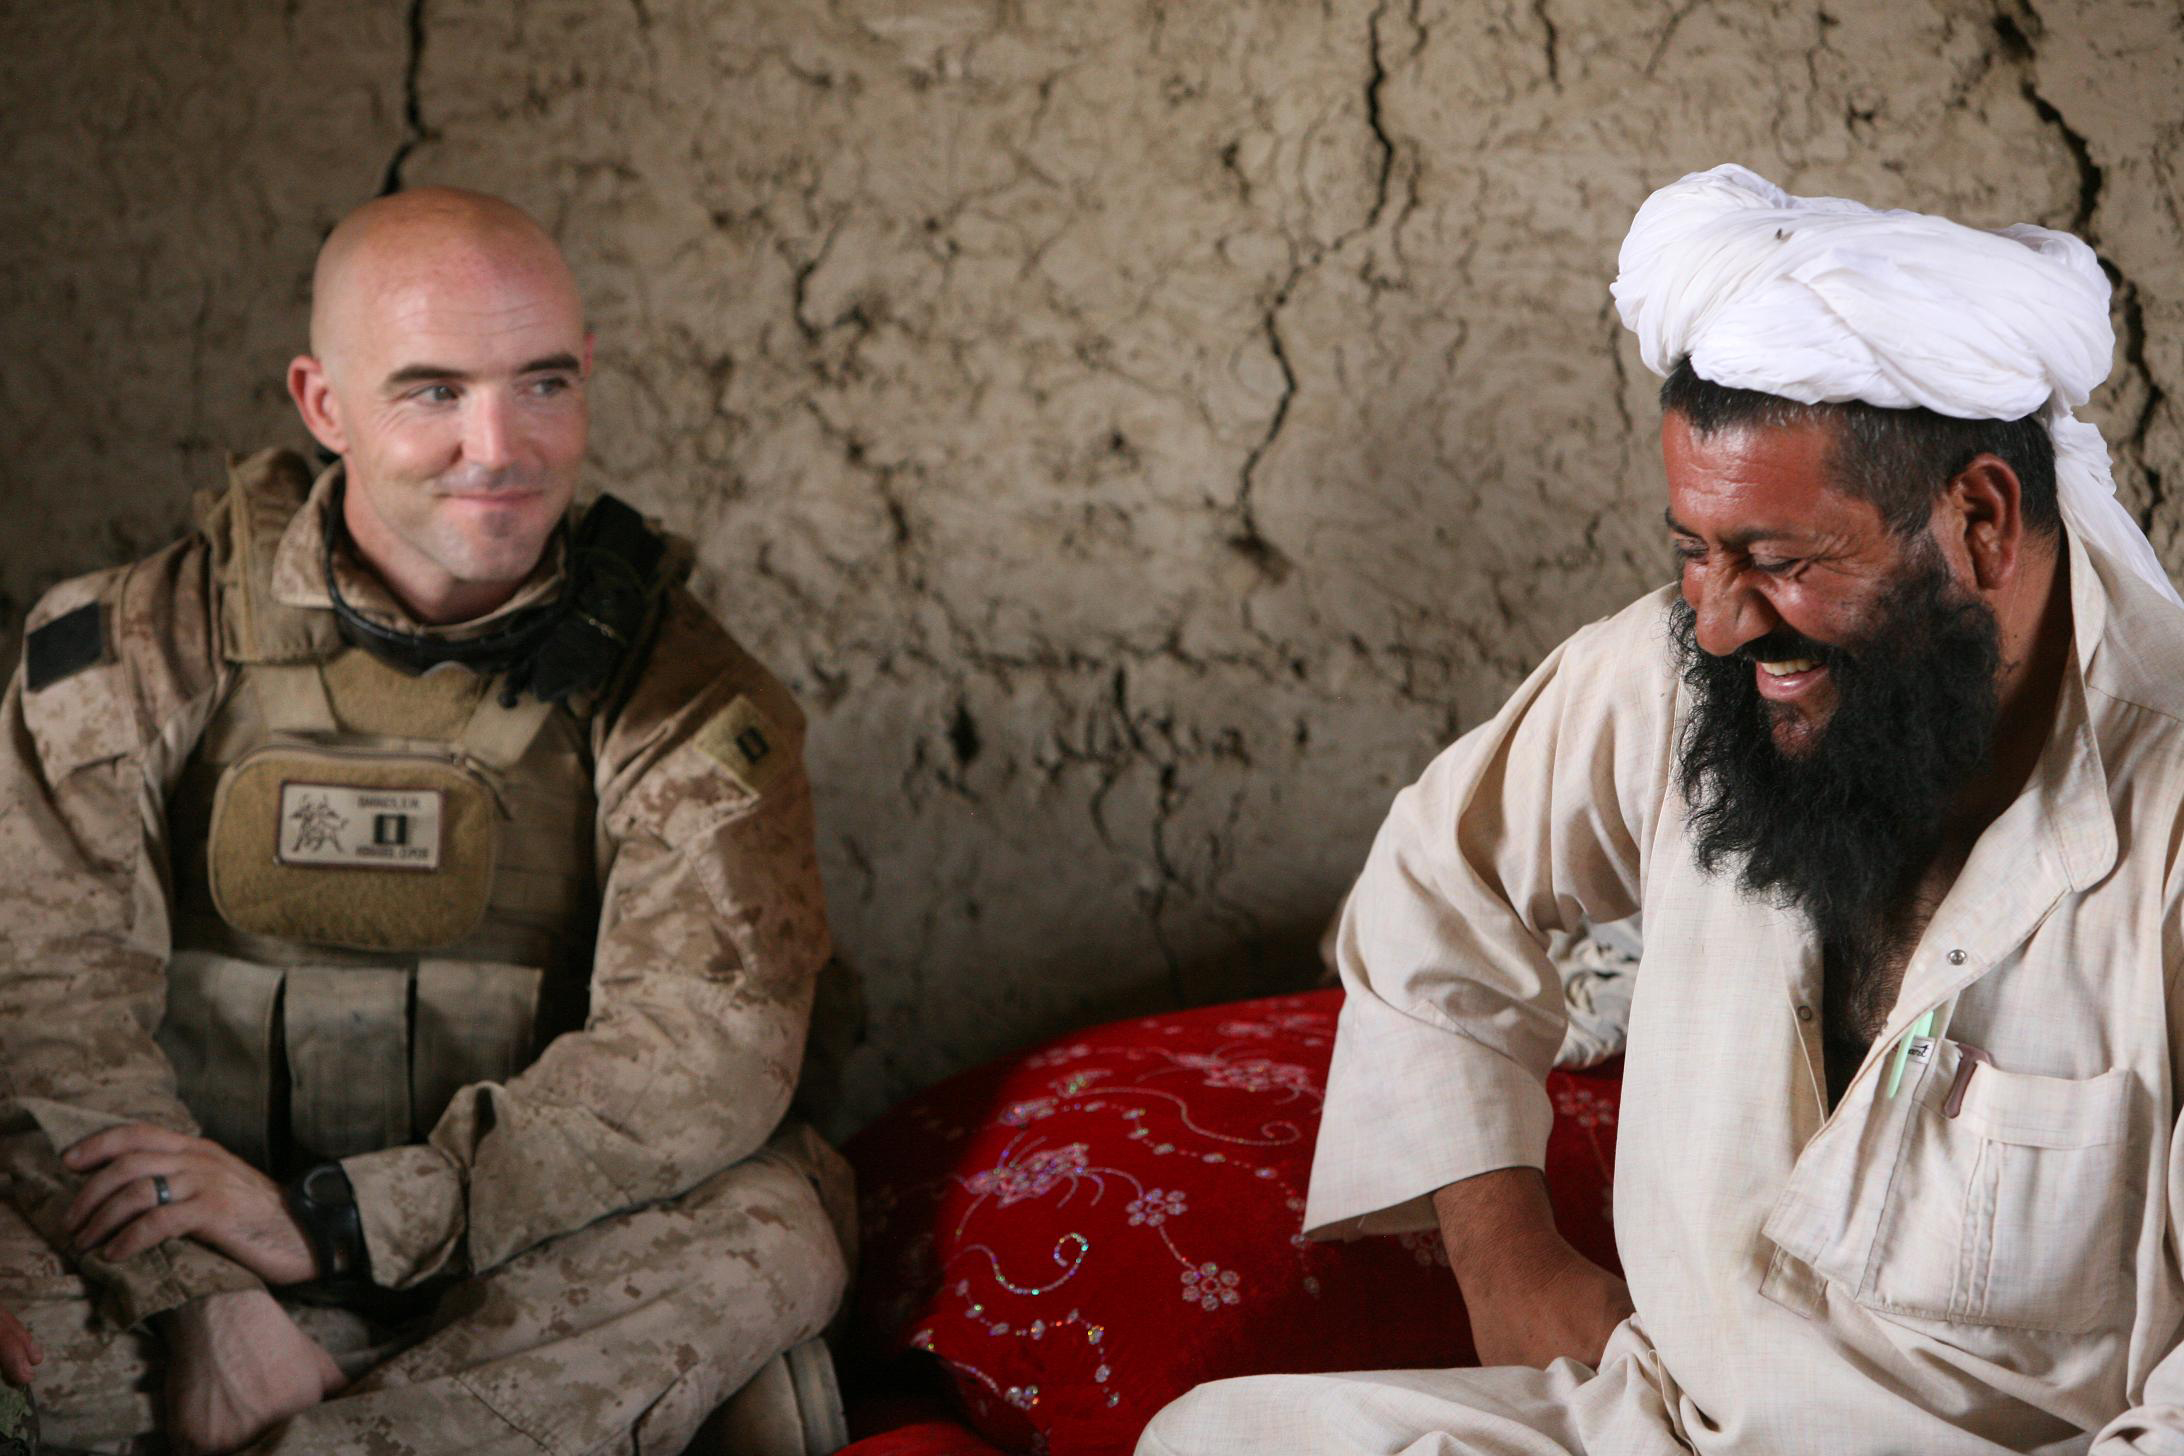 Defense.gov_News_Photo_100807-M-7038Y-028_-_U.S._Marine_Corps_Capt._Sean_Barnes_left_with_3rd_Battalion_1st_Marine_Regiment_Regimental_Combat_Team_7_listens_as_an_Afghan_National_Army (1).jpg